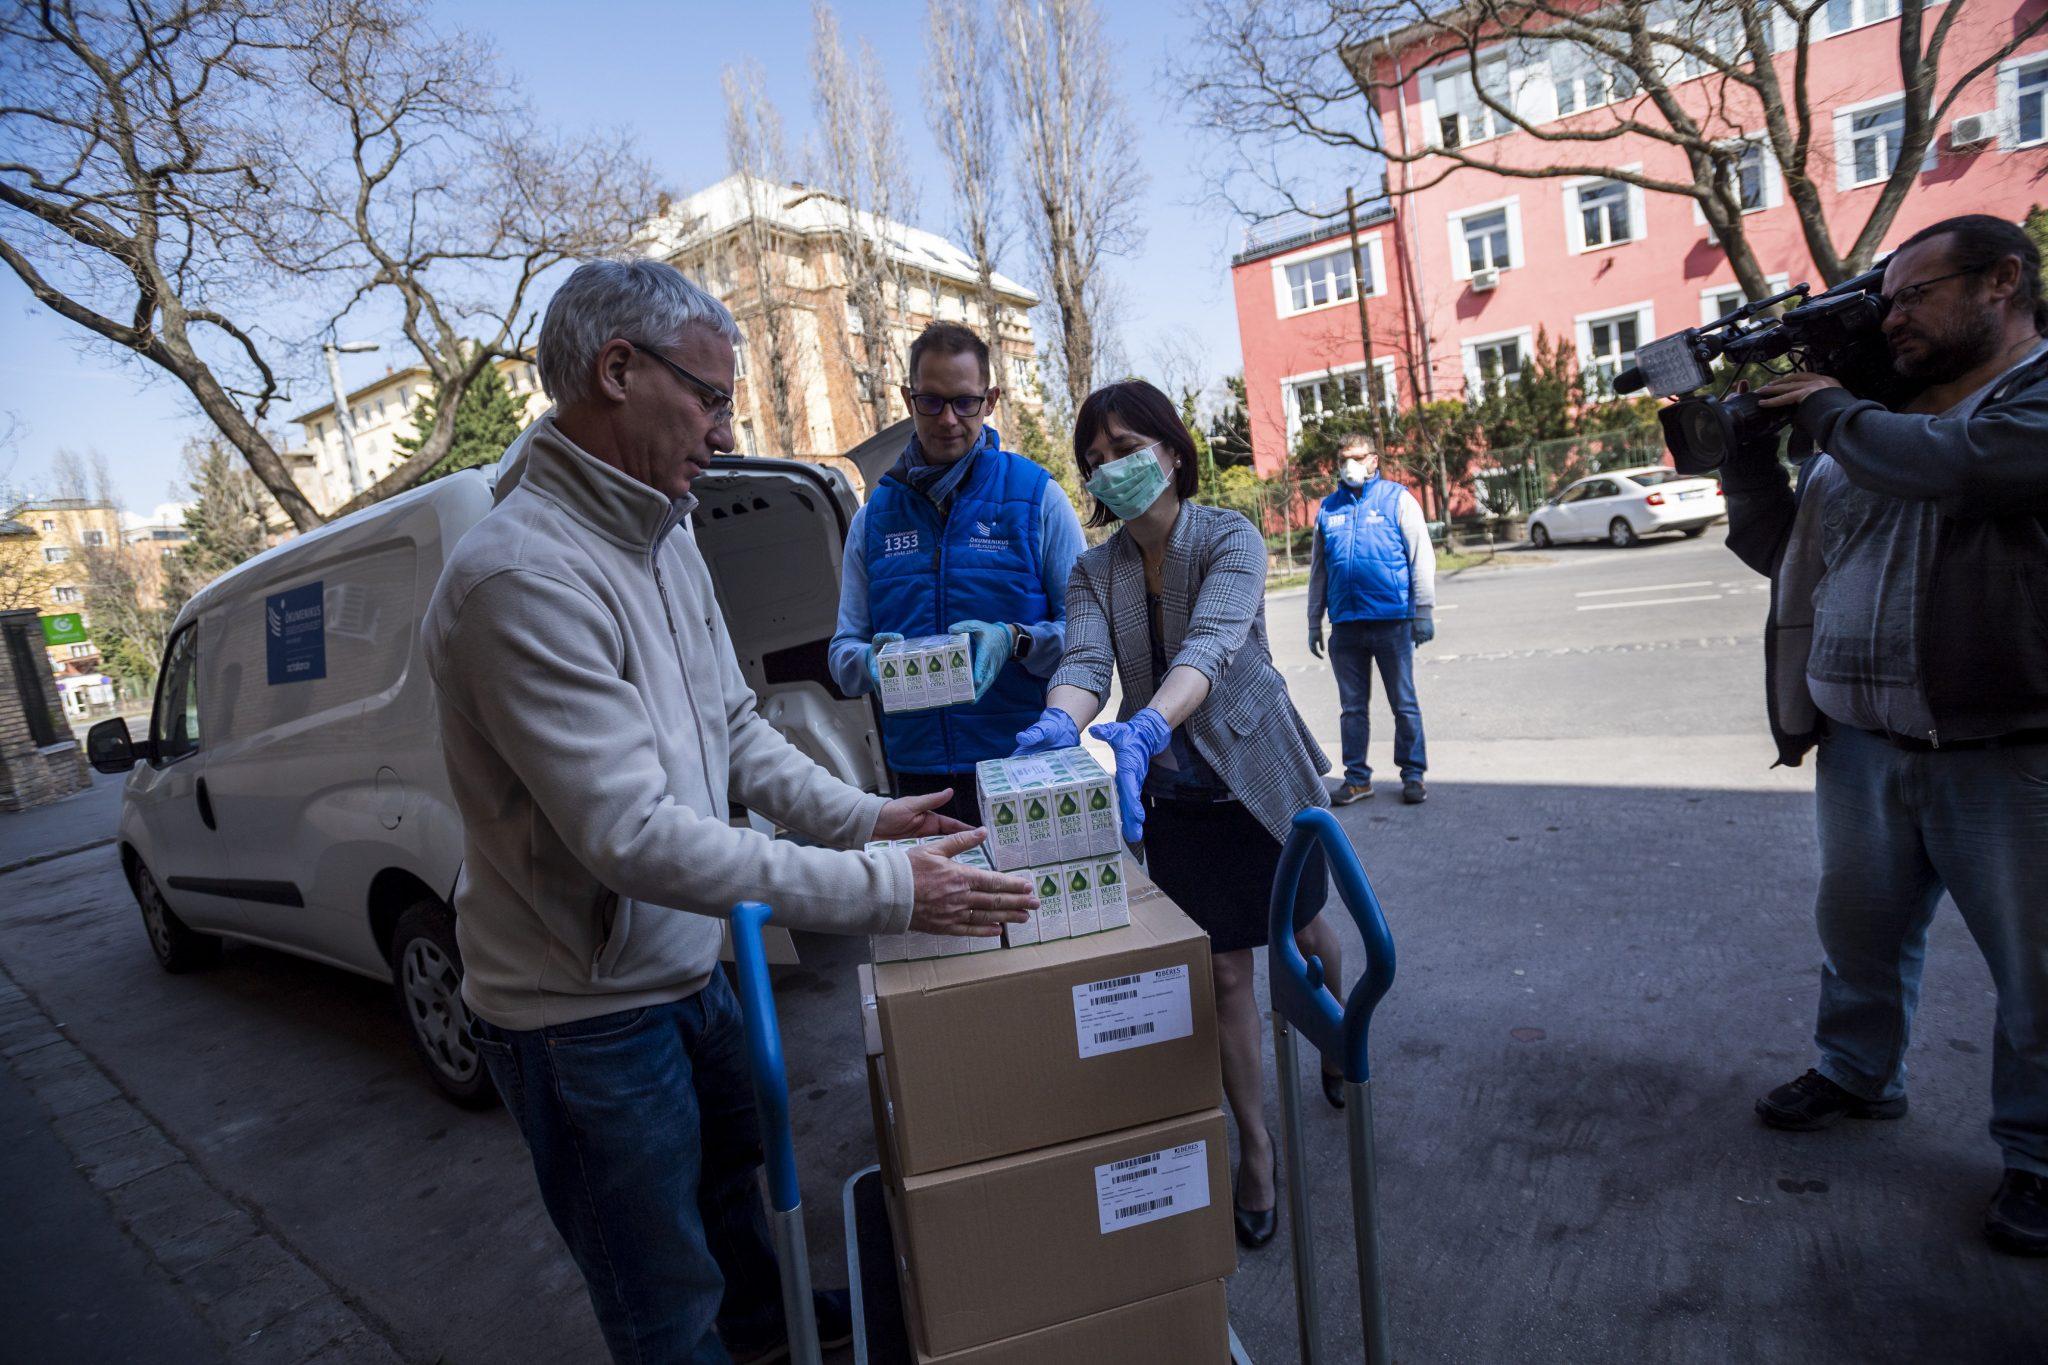 Coronavirus: Béres Donates 10,000 Bottles of Immune System Fortifier post's picture